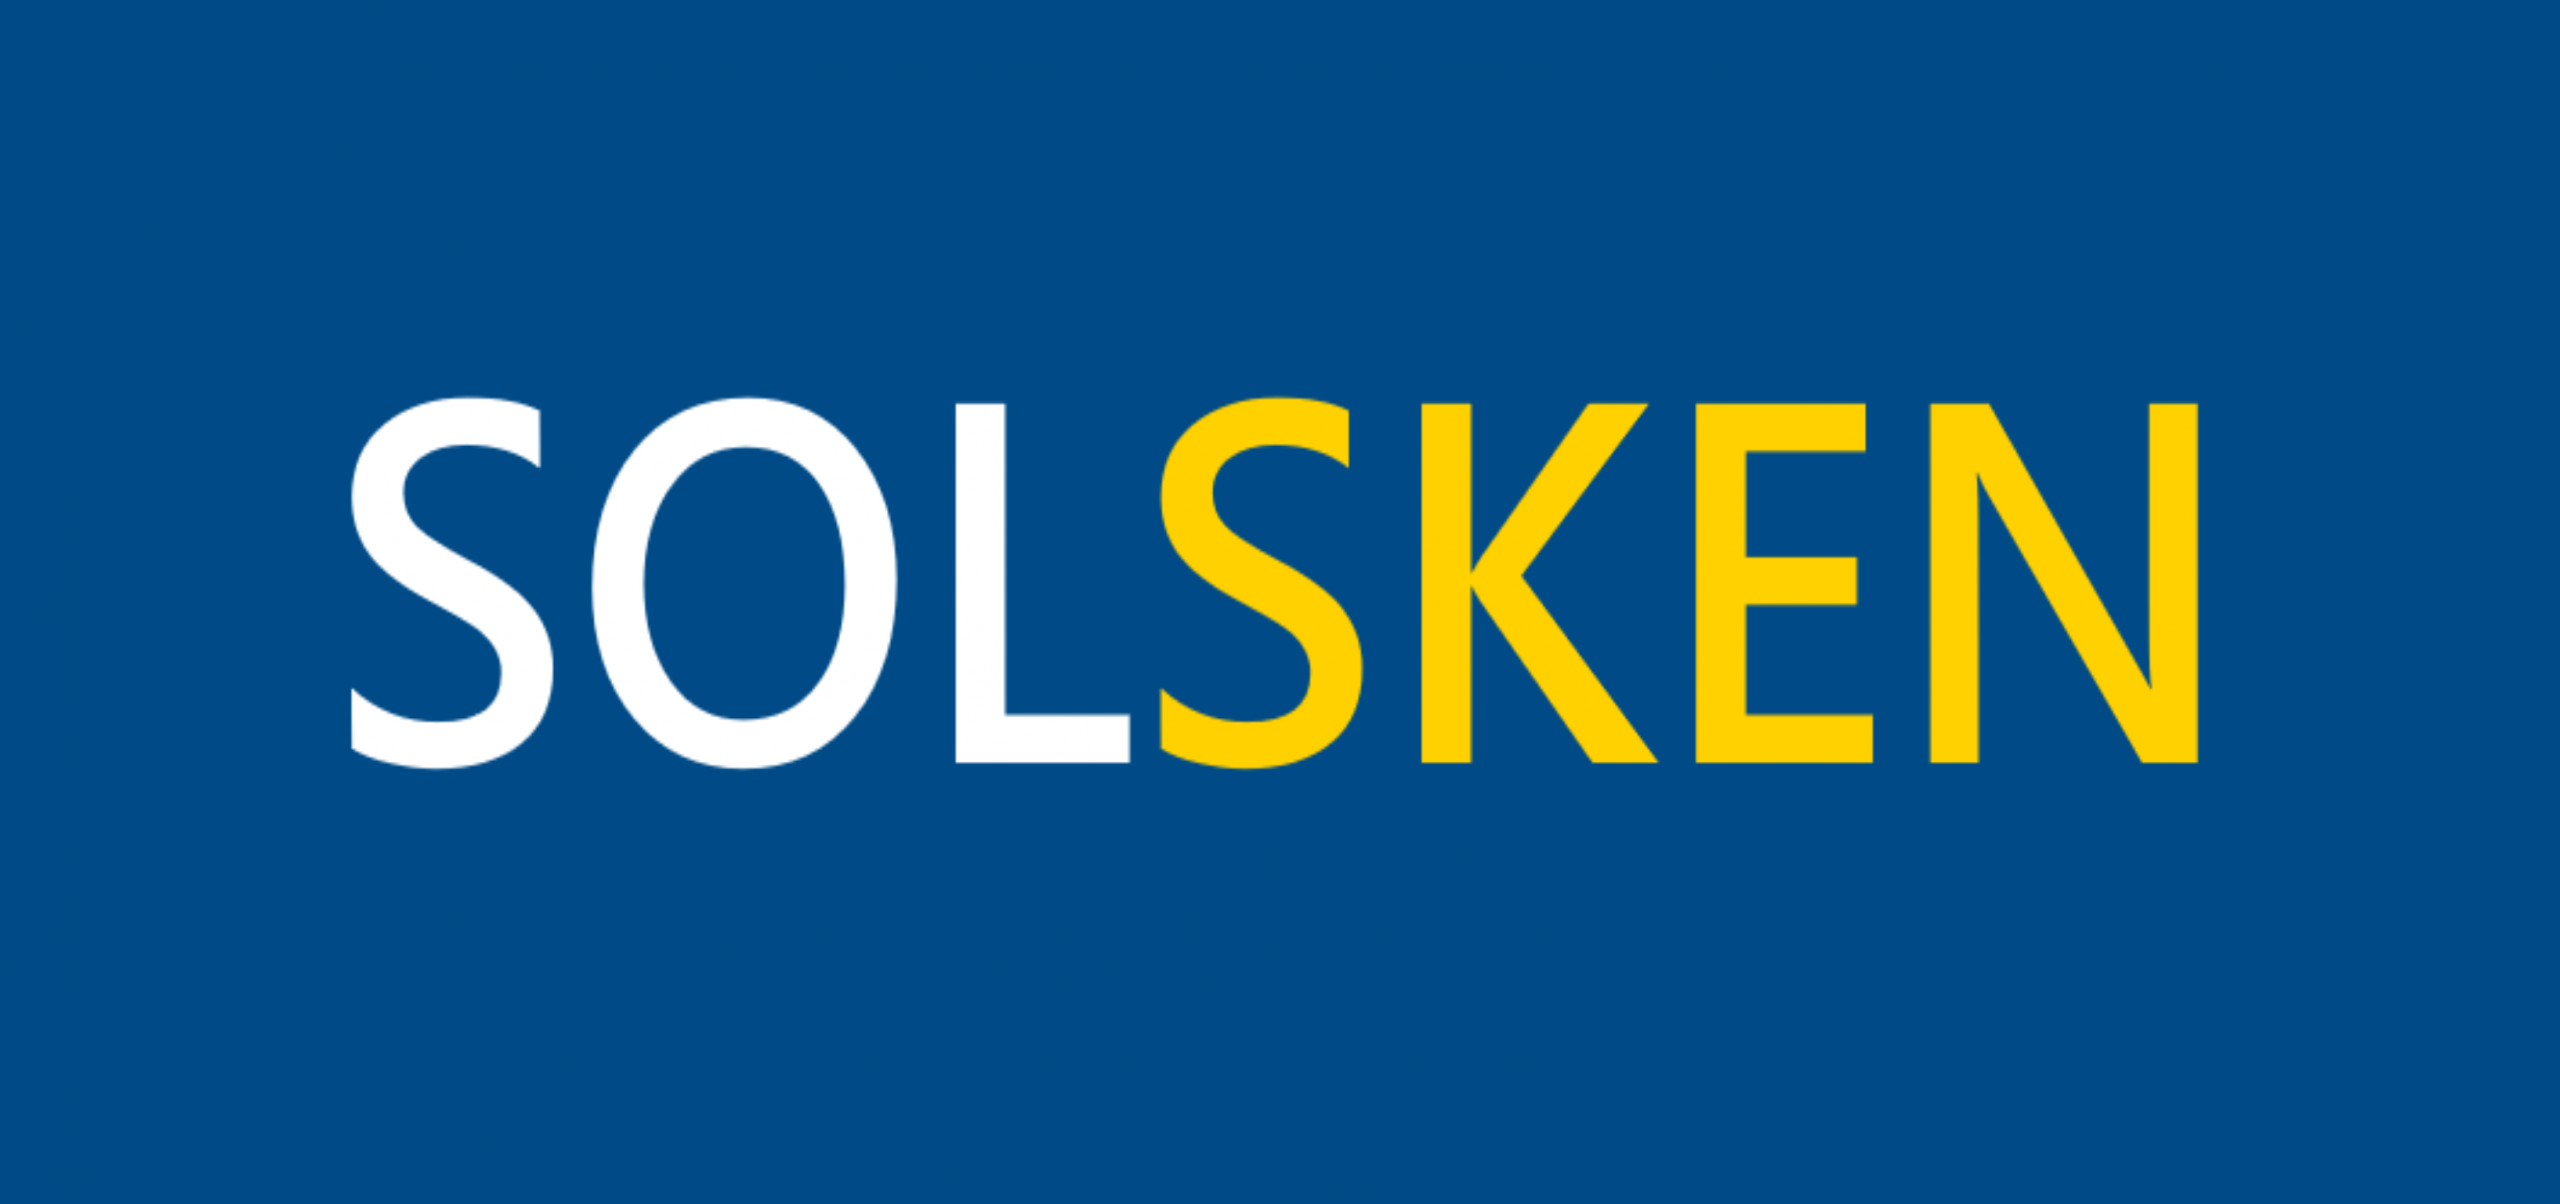 Solsken Limited